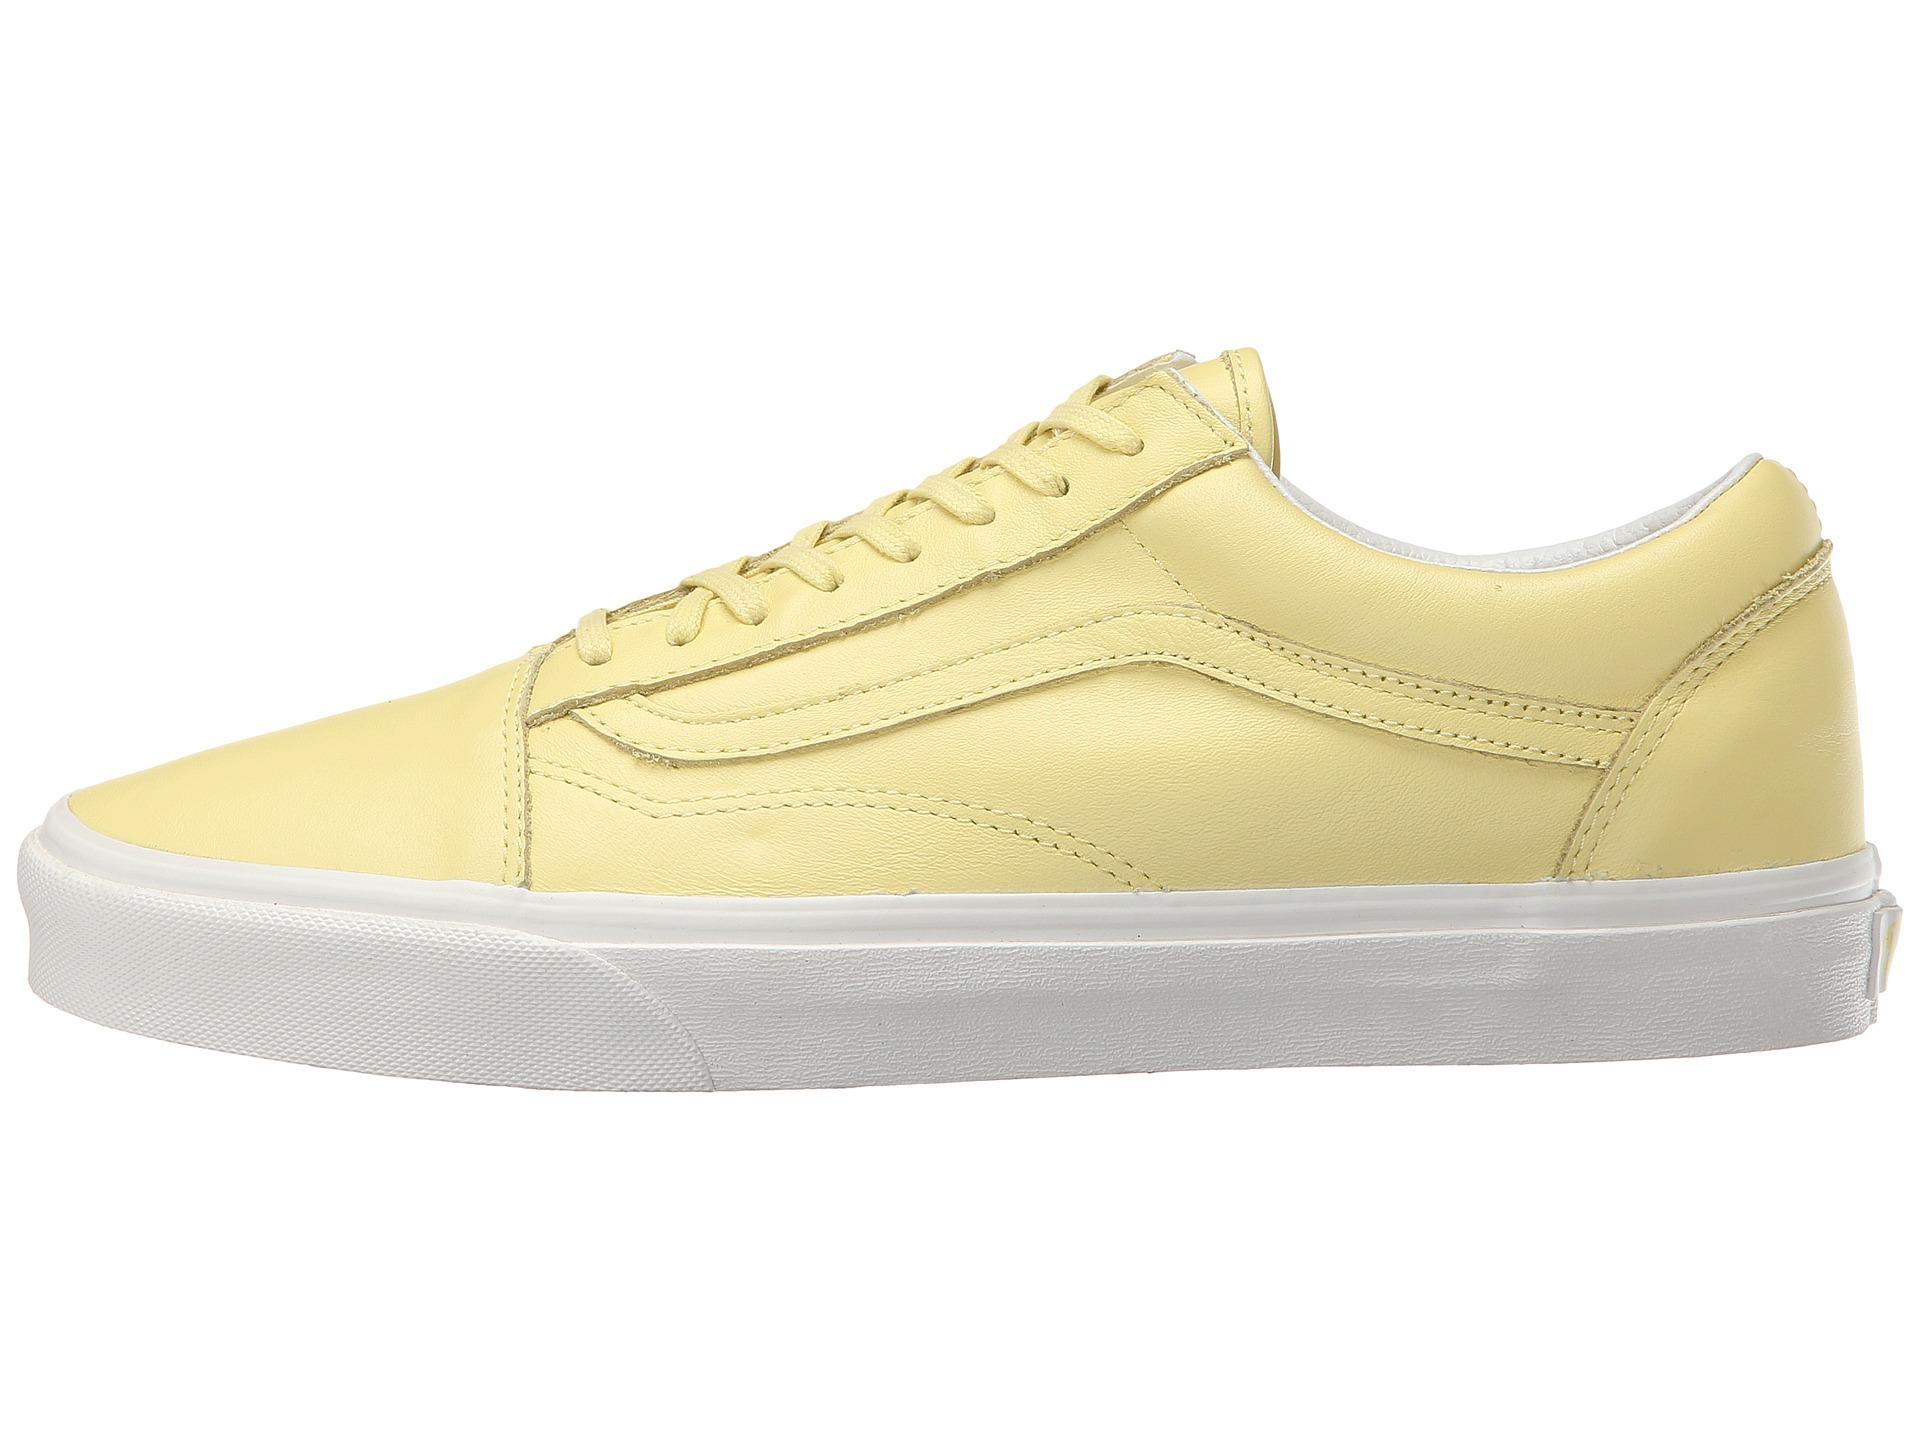 Vans Old Skoolu2122 (Pastel Pack) Yellow Cream/Blanc De Blanc - Zappos.com Free Shipping BOTH Ways